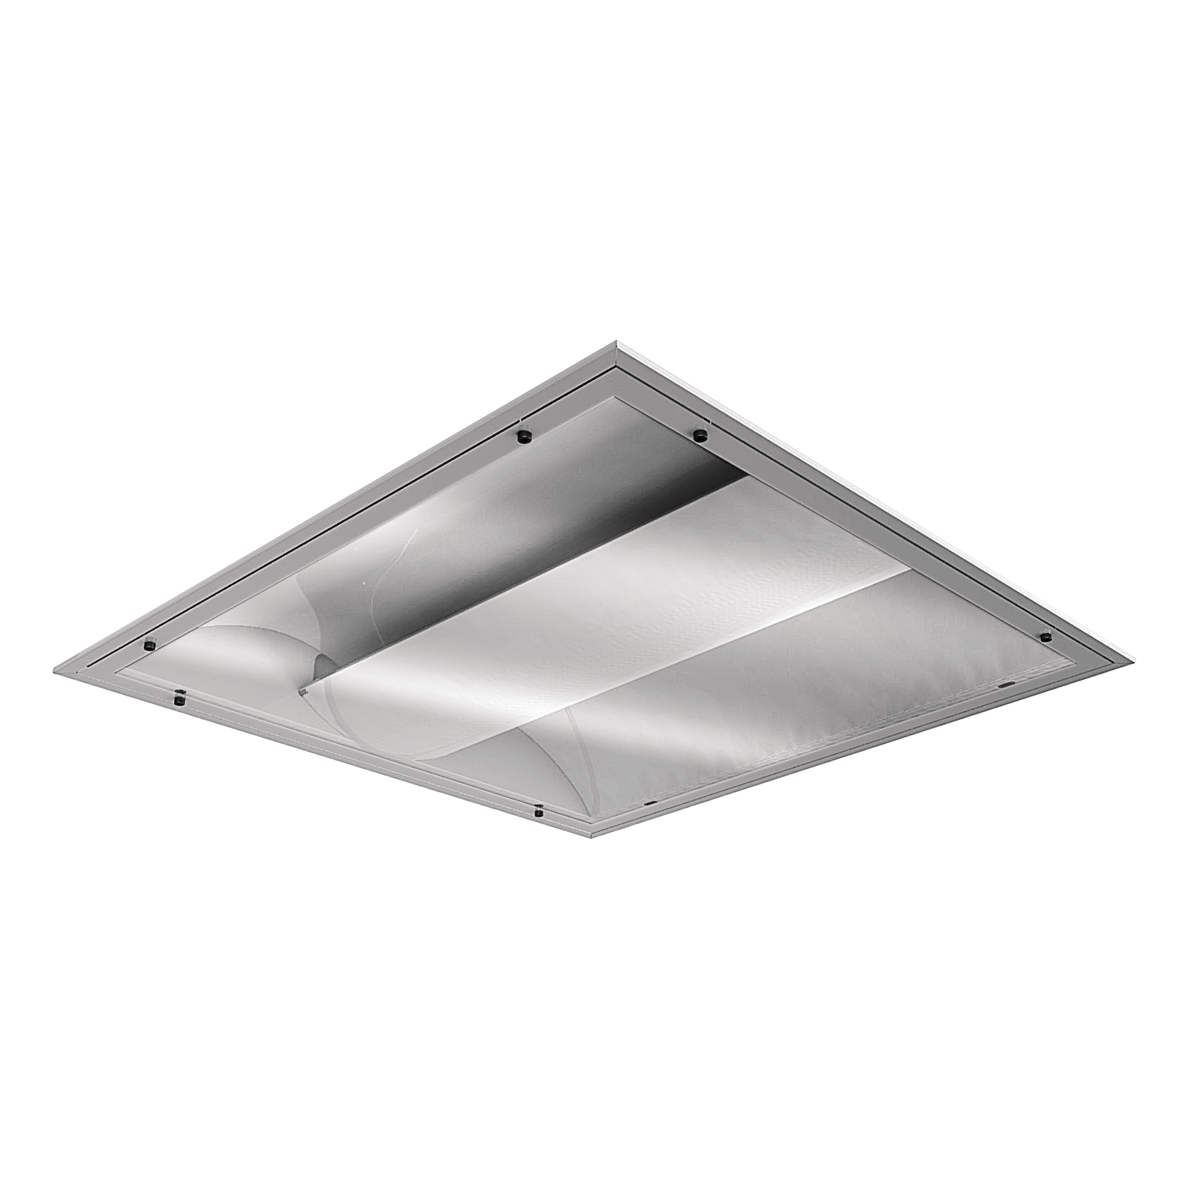 Luminaire Indirect destiné indirect light luminaires - lug